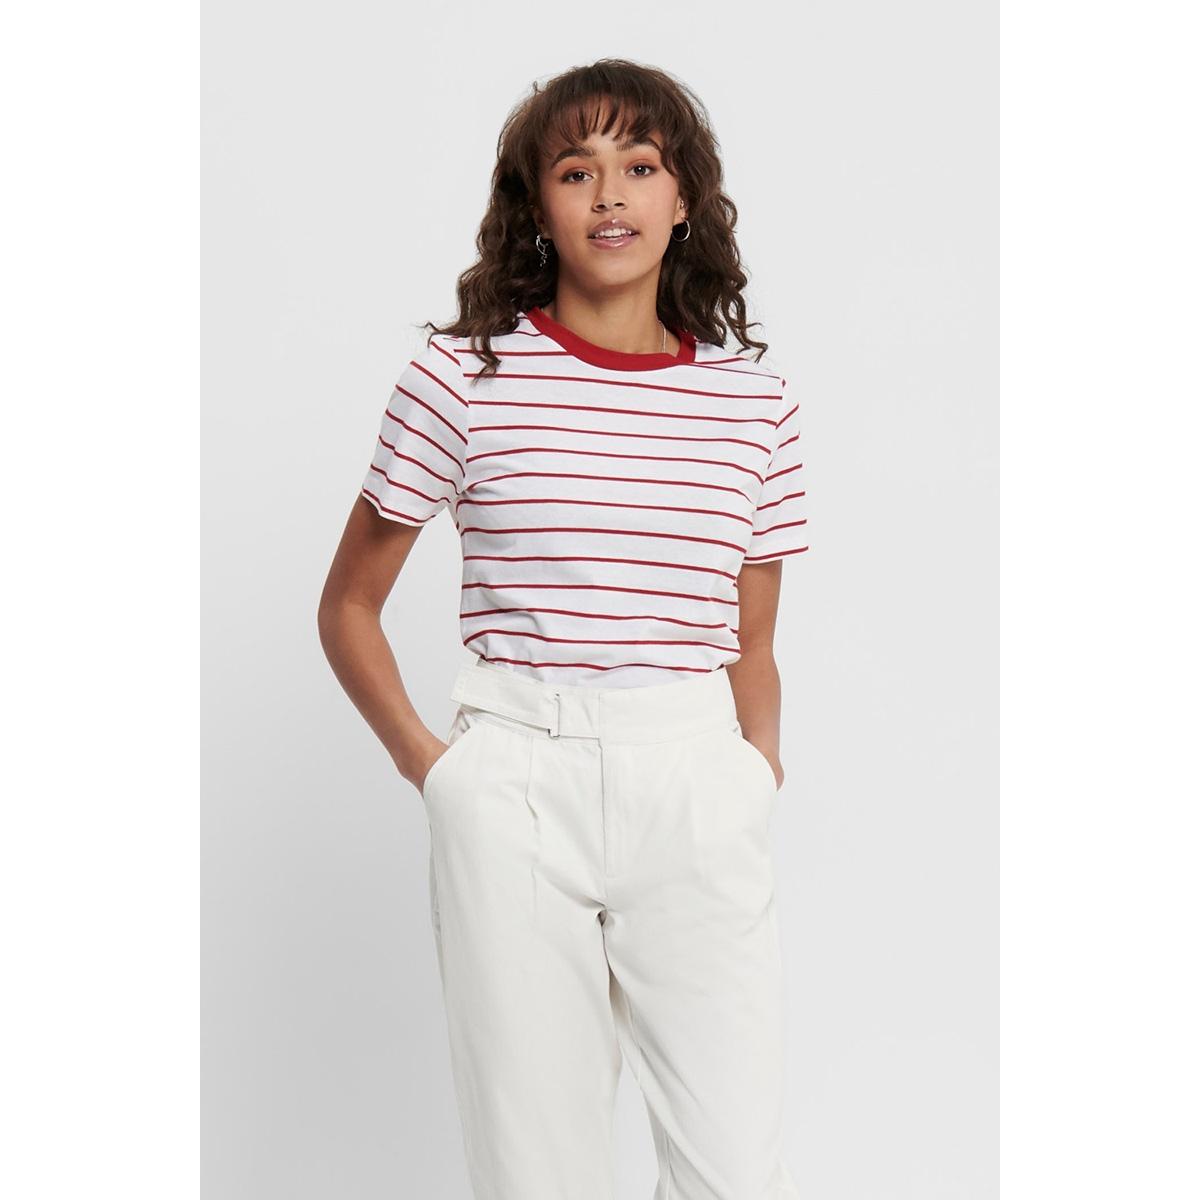 jdybest life s/s stripe top jrs 15195986 jacqueline de yong t-shirt bright white/scarlet sa